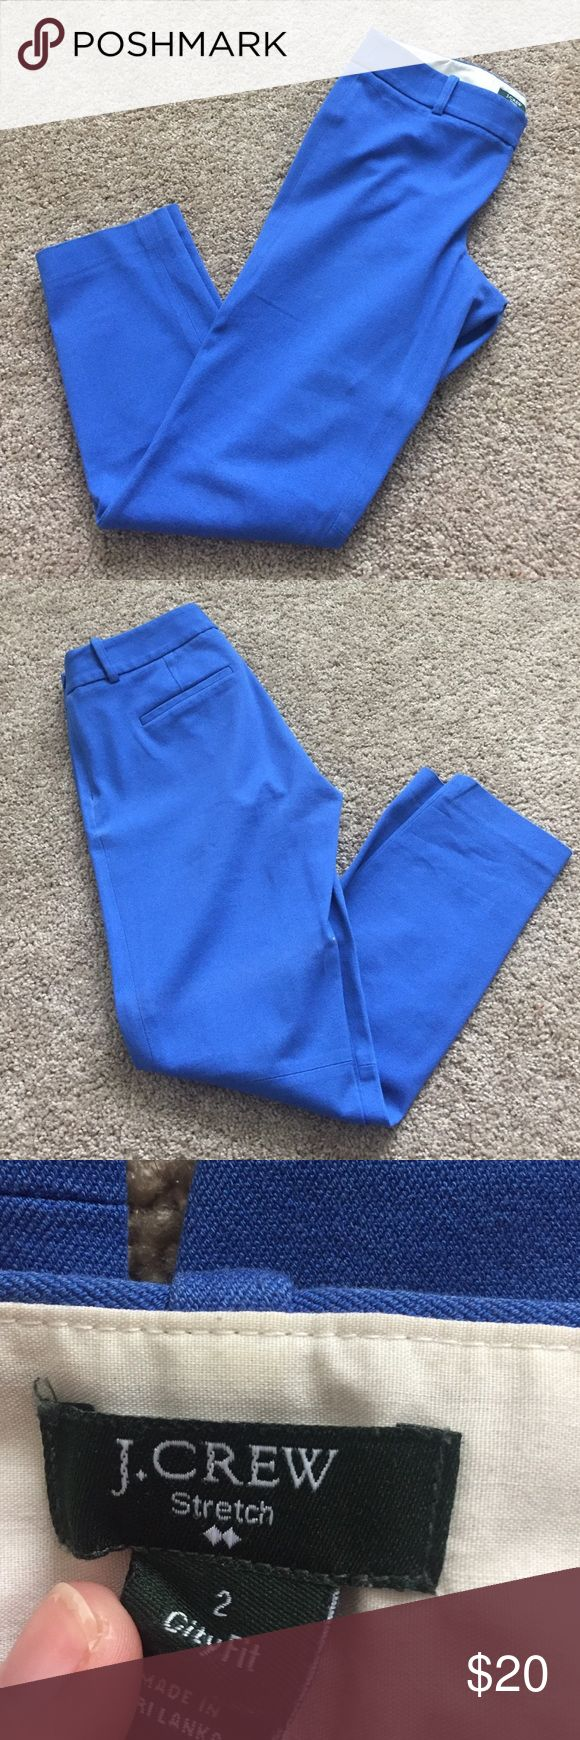 J. Crew City Fit Pant J. Crew - City Fit - Size 2 - Side Zip - Cobalt Blue - cropped J. Crew Pants Ankle & Cropped